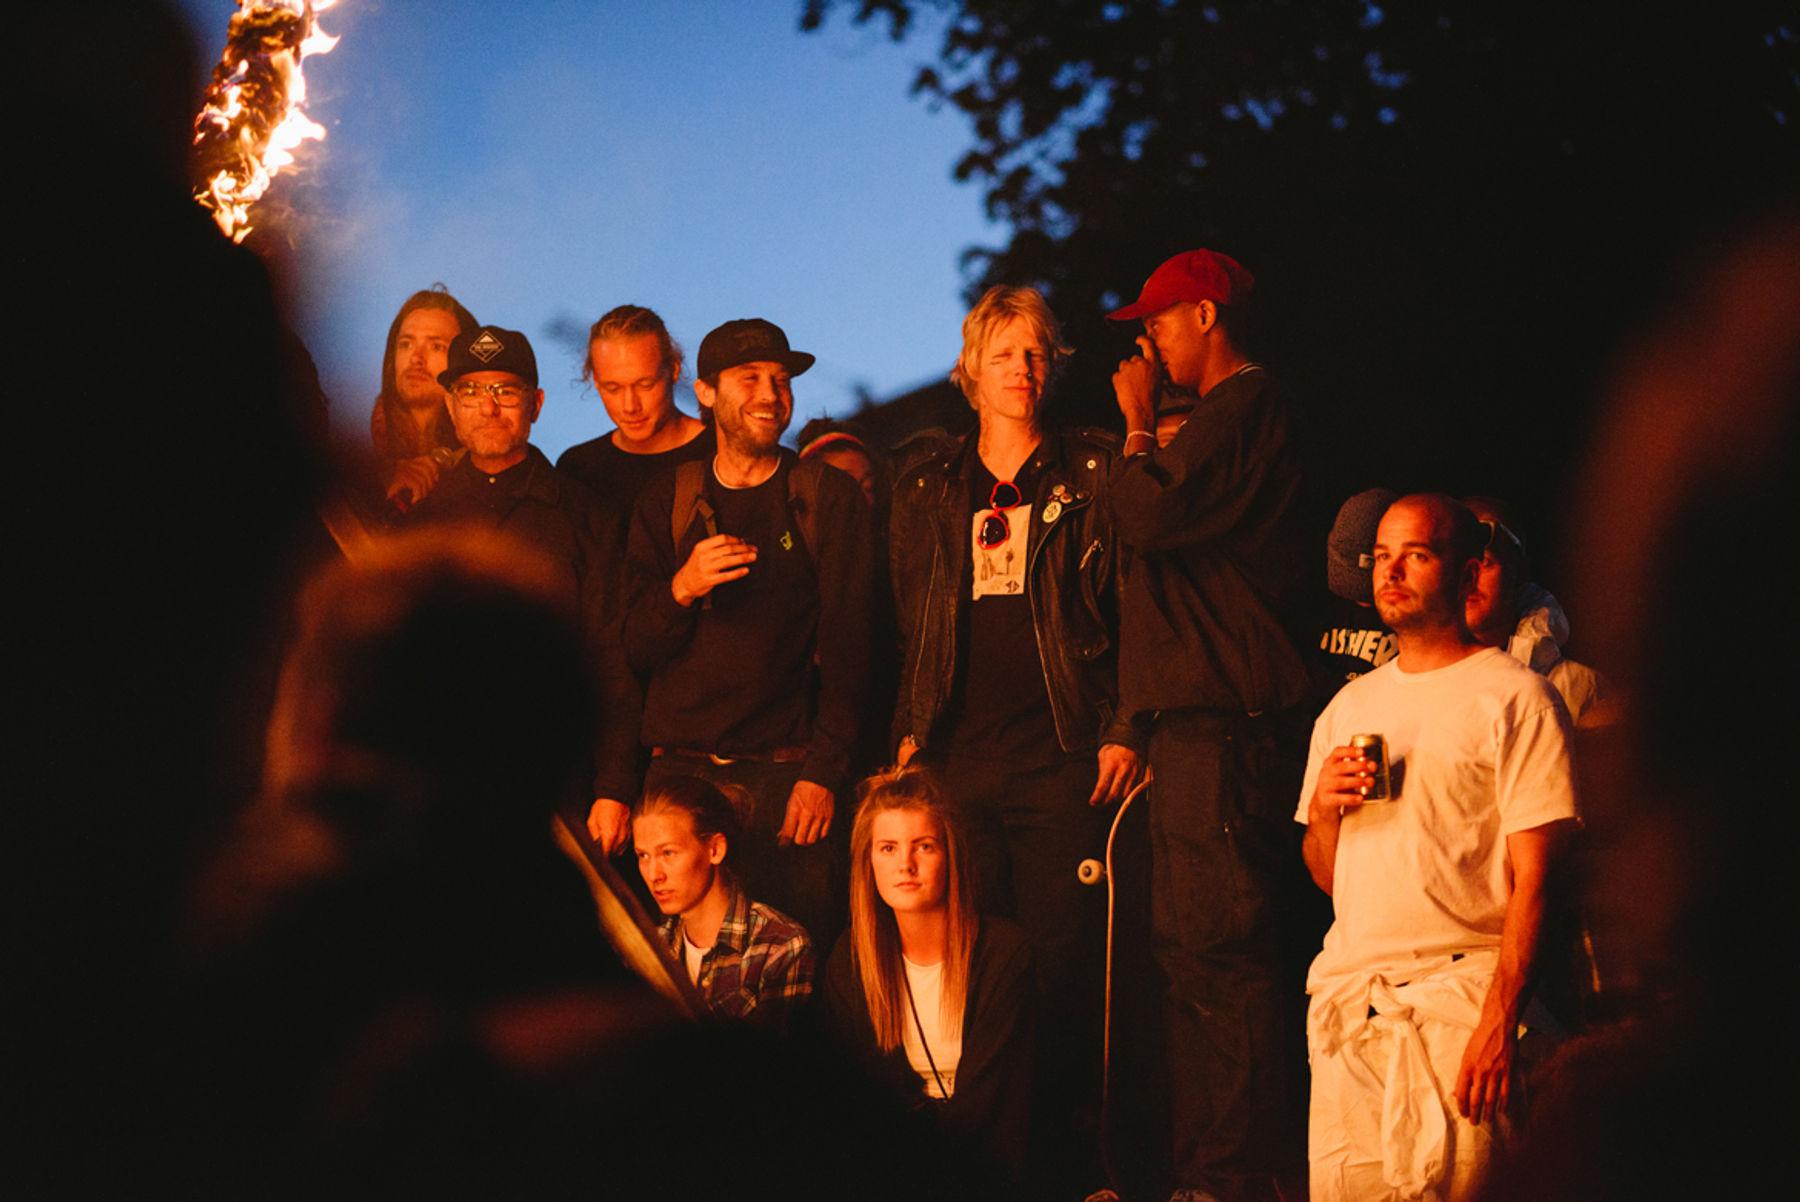 _IHC3509-Braydon-Szafranski-Ishod-Wair-Nike-SB-Copenhagen-Heart-On-Fire-Day-1-Faelledparken-July-2015-Photographer-Maksim-Kalanep